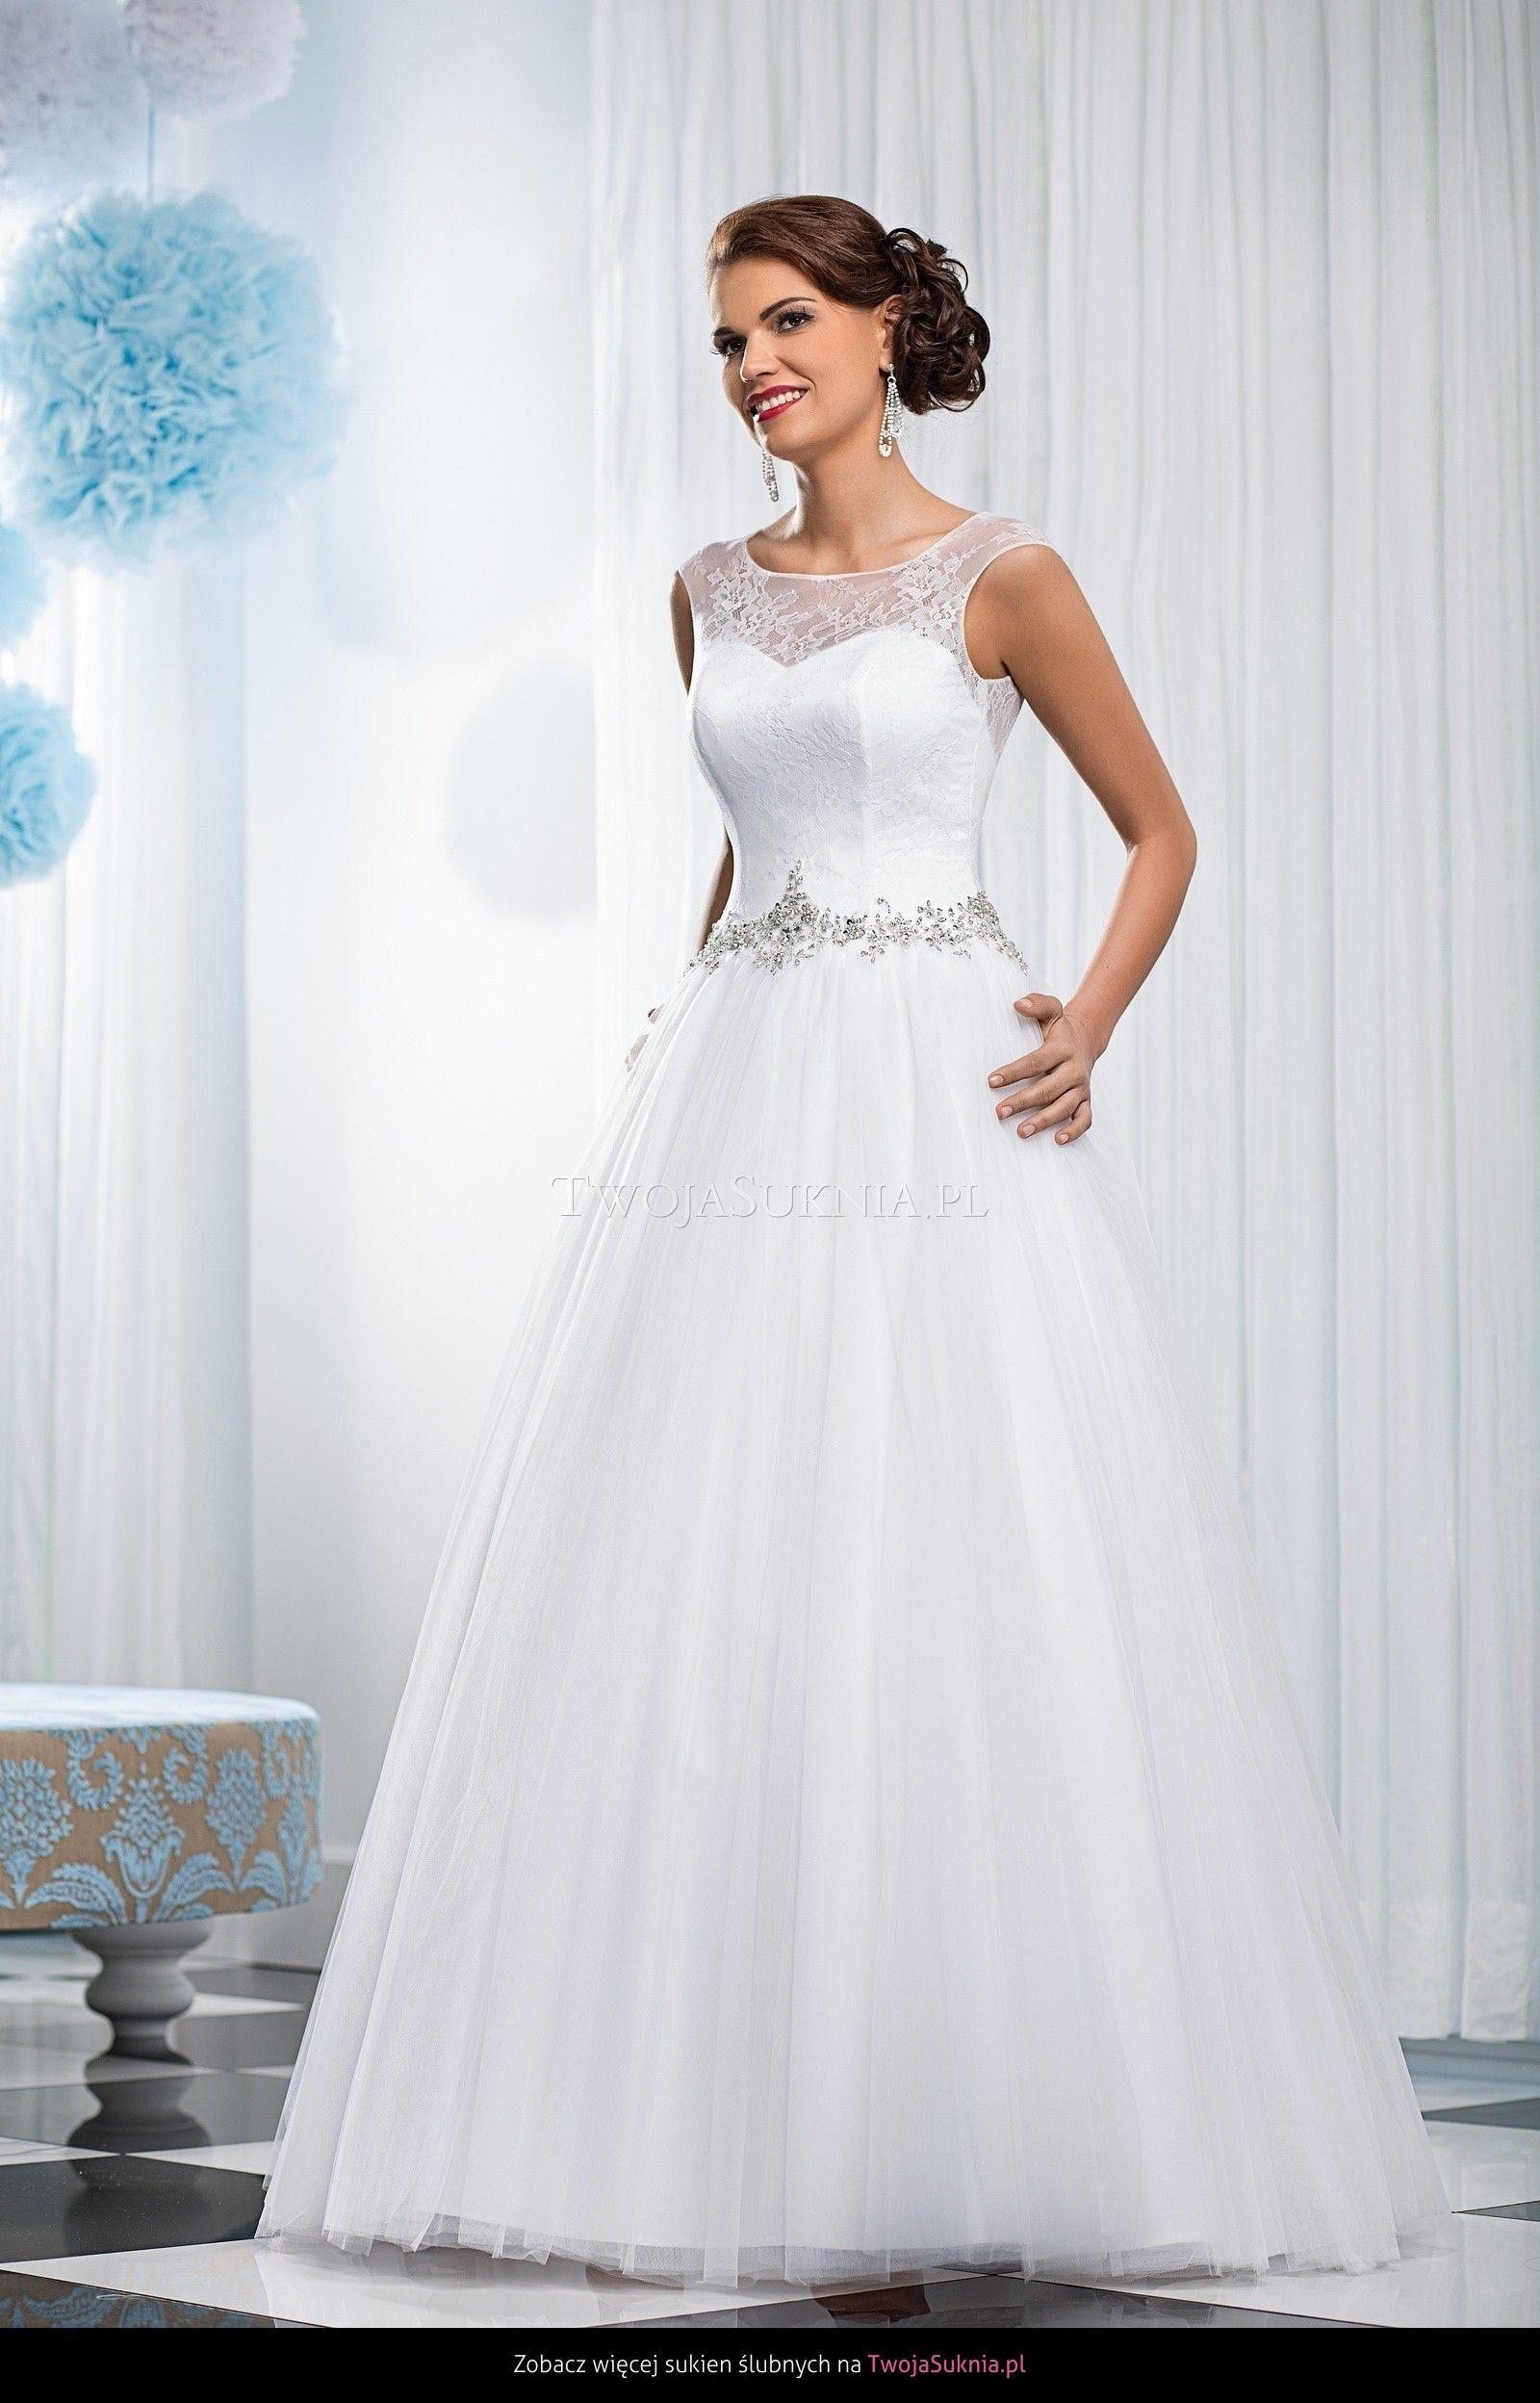 6311502a31 La Lucienne - Opal - Luxury Suknie Ślubne